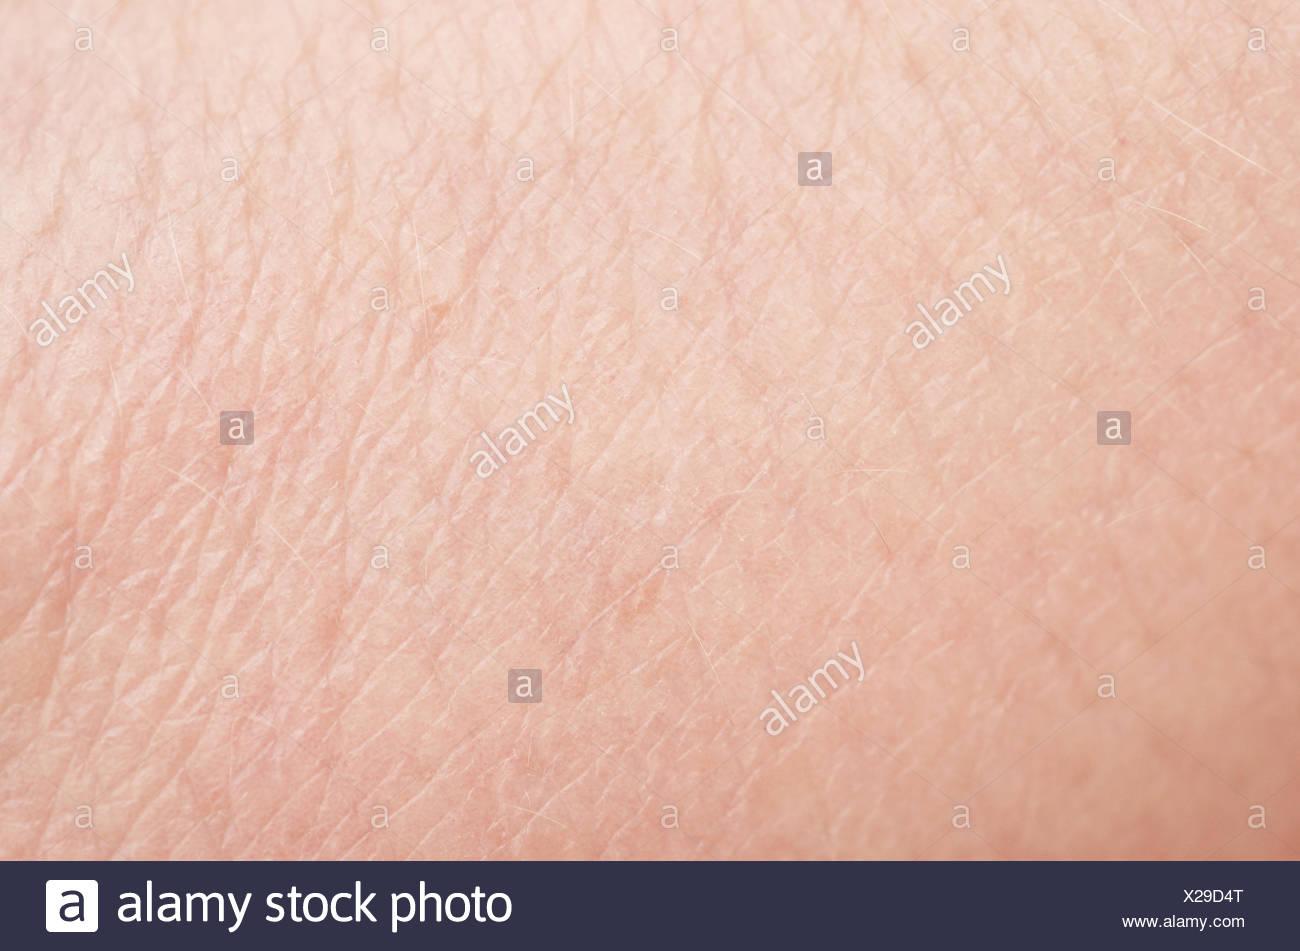 pelle umana Immagini Stock